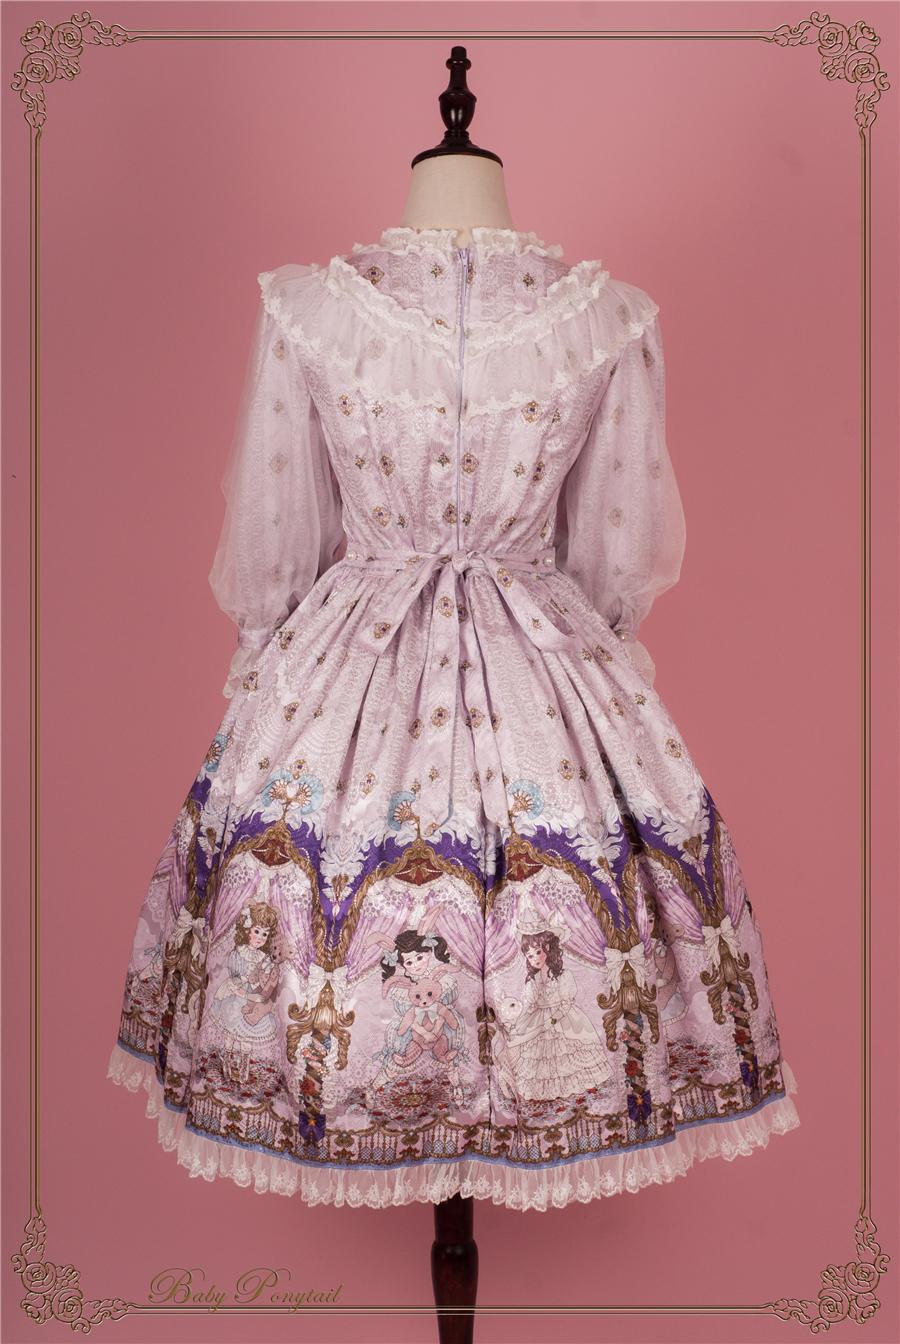 BabyPonytail_Stock Photo_My Favorite Companion_OP Lavender_08.jpg